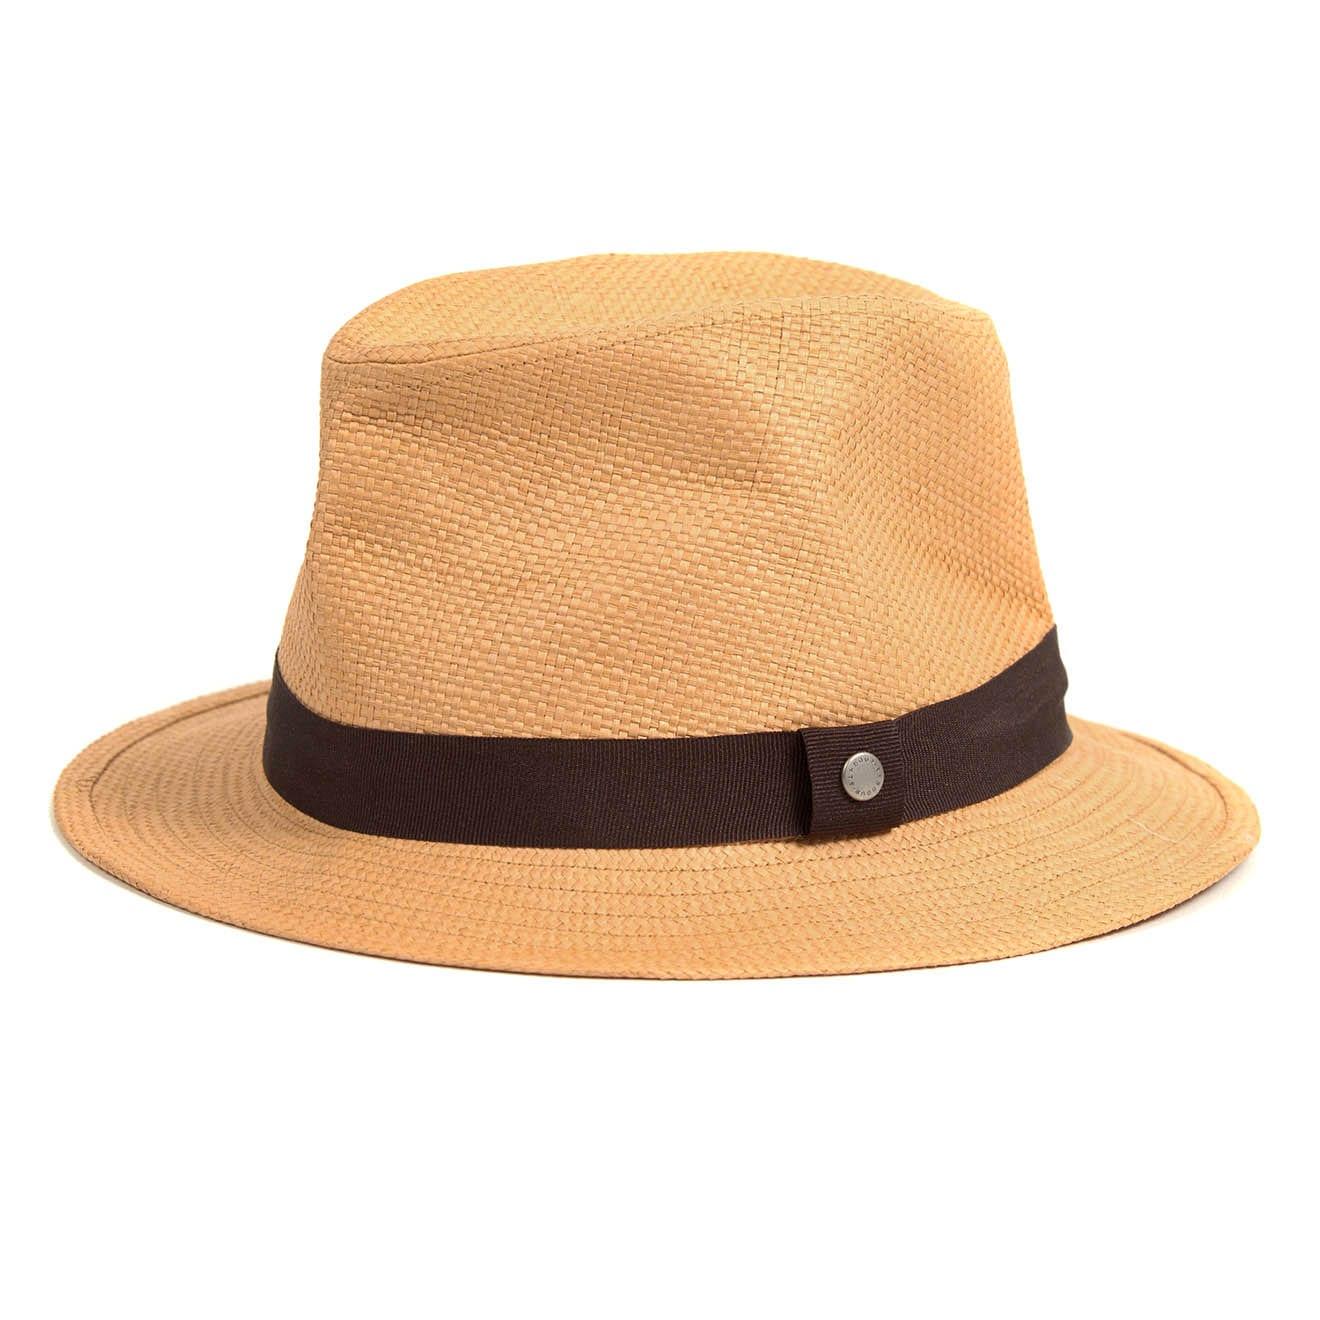 Barbour Emblem Trilby Hat Tobacco